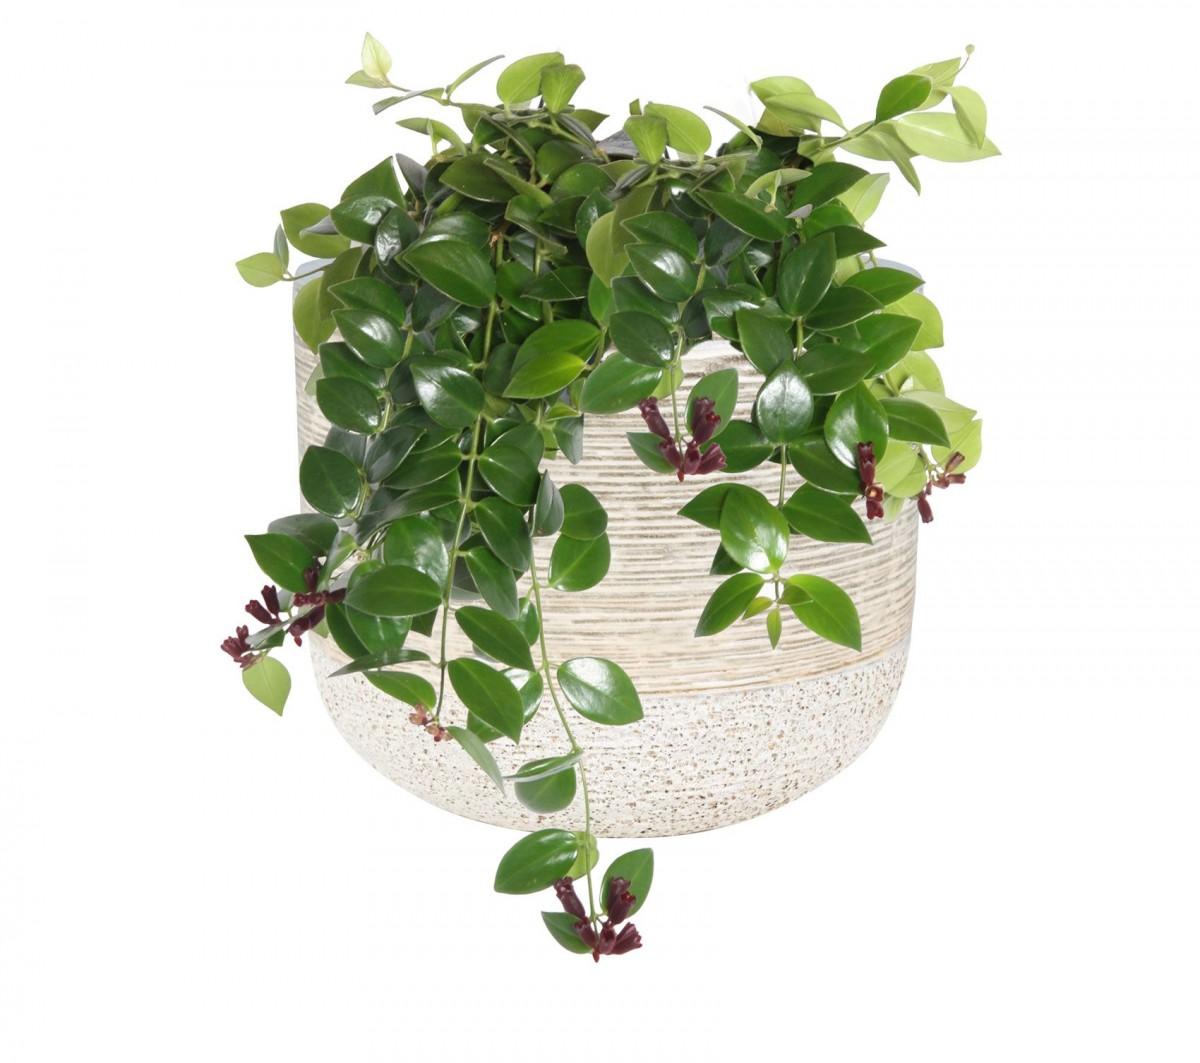 Plantenkamer-issa-lichtgrijs-wandhanger